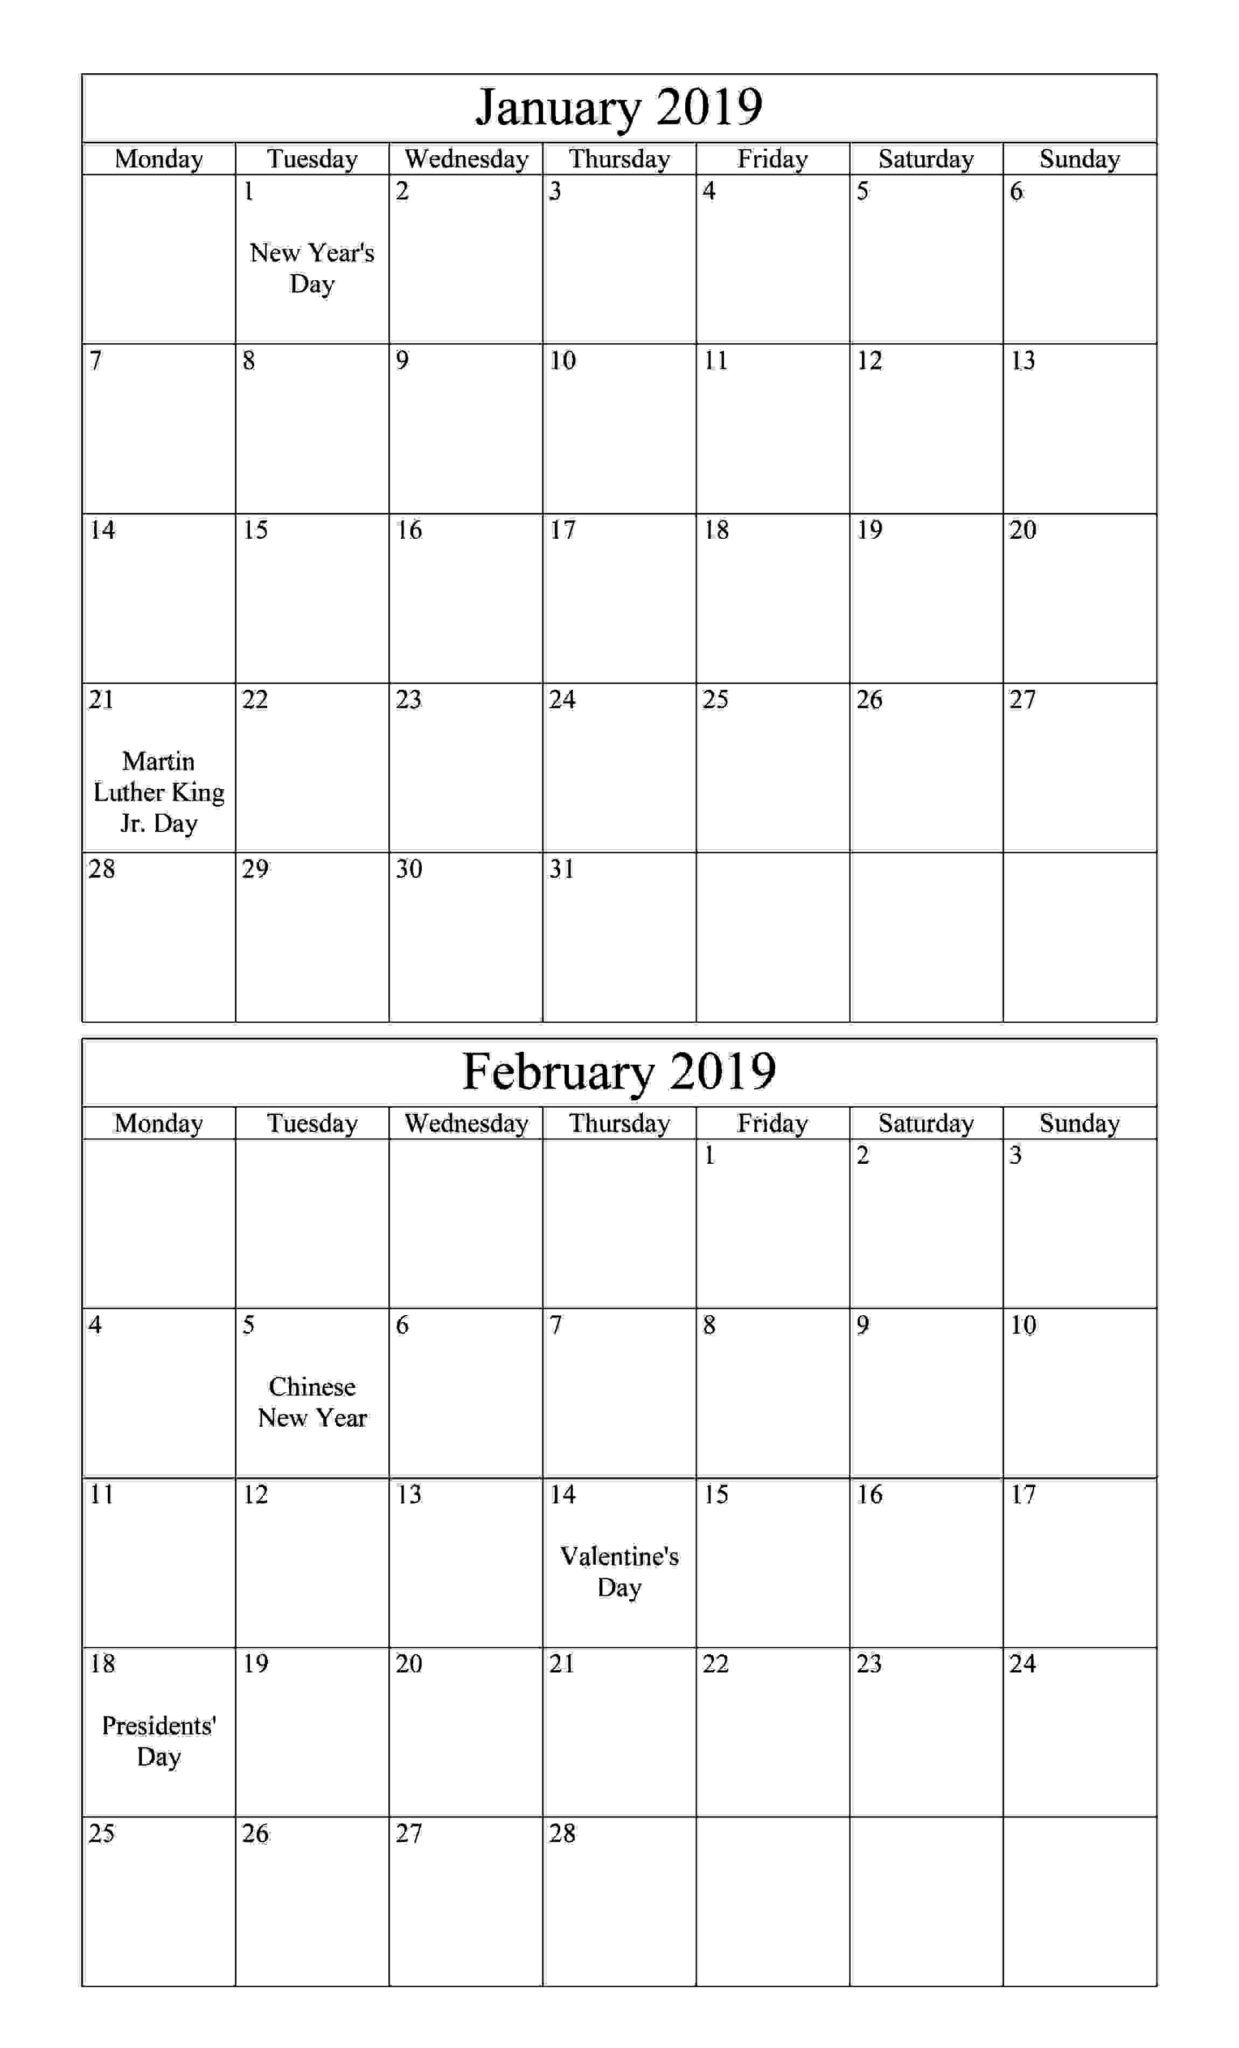 January February 2019 Calendar With Holiday 100 January And